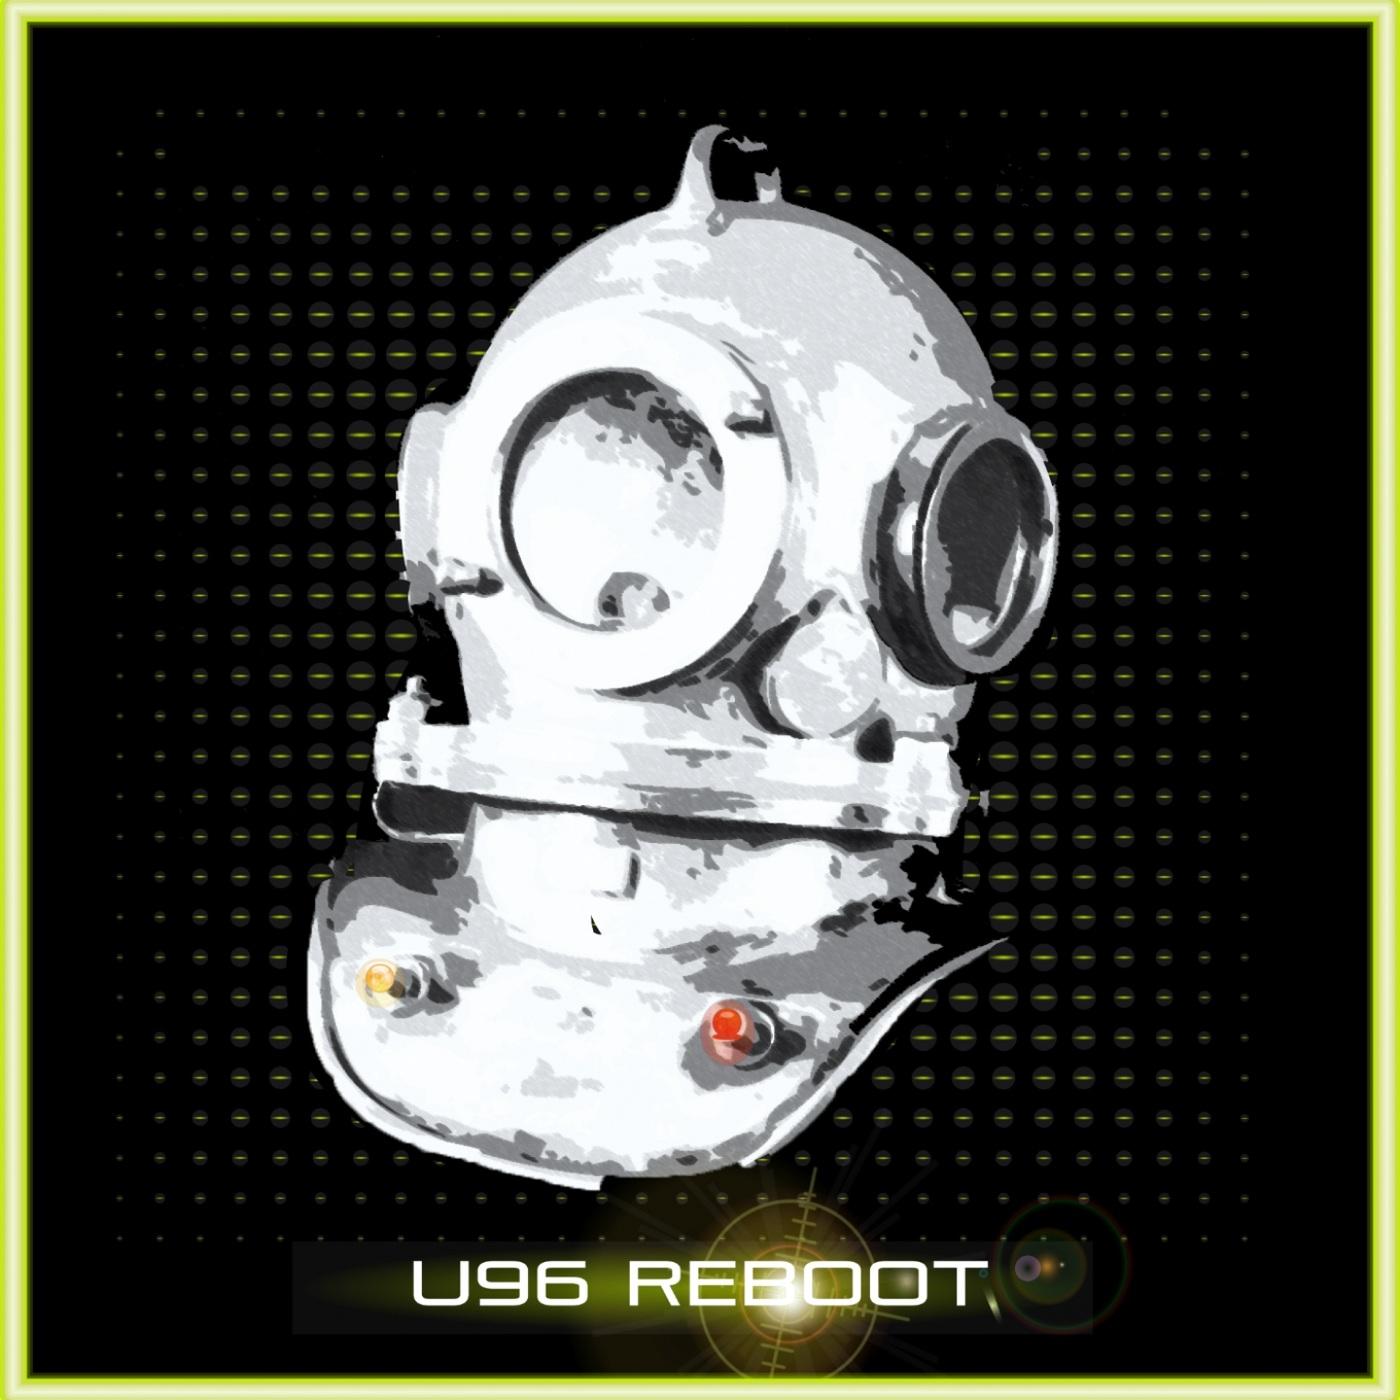 U96 - Reboot (2018)